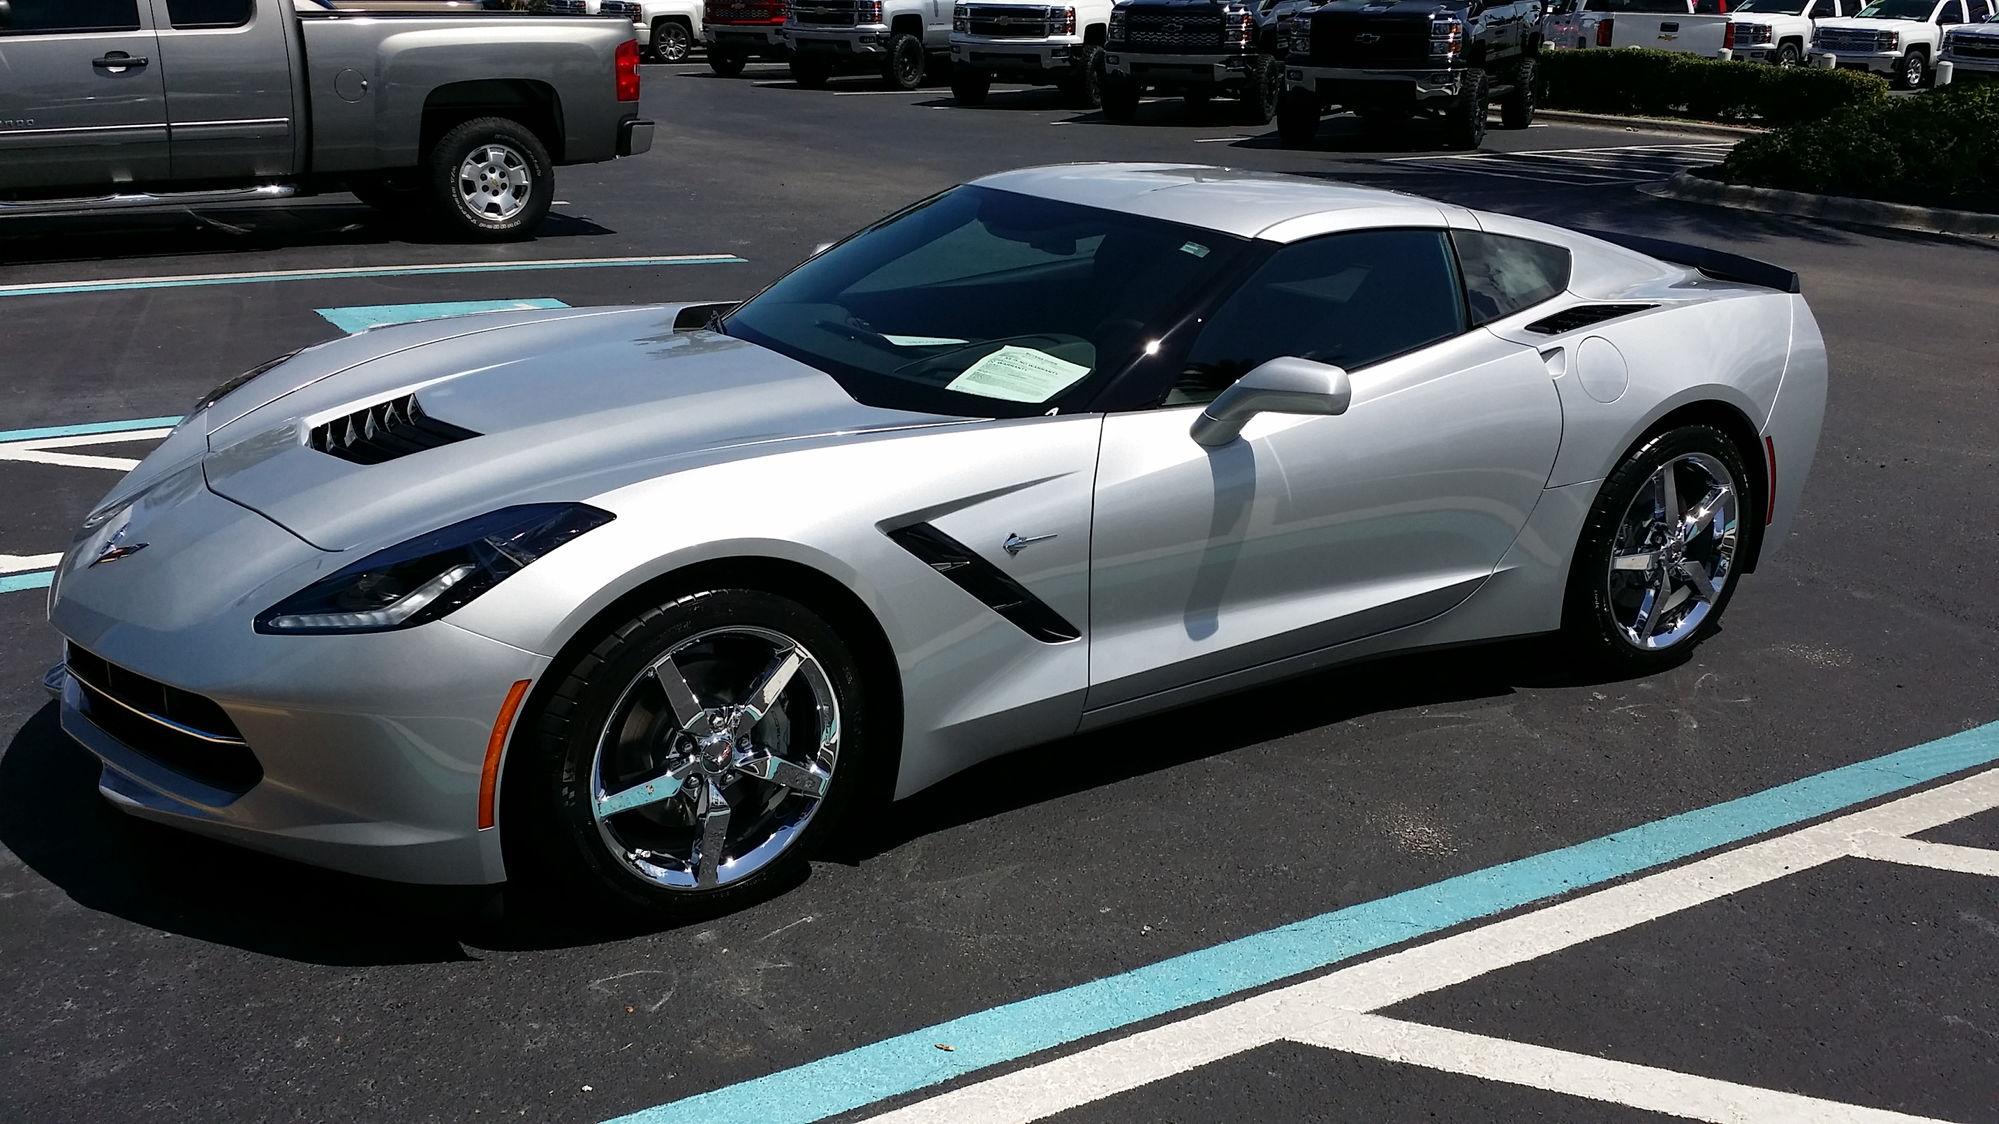 26 New Chevrolet Corvette In Plant City Stingray Chevrolet U003eu003e Preowned  Stingrays, One New